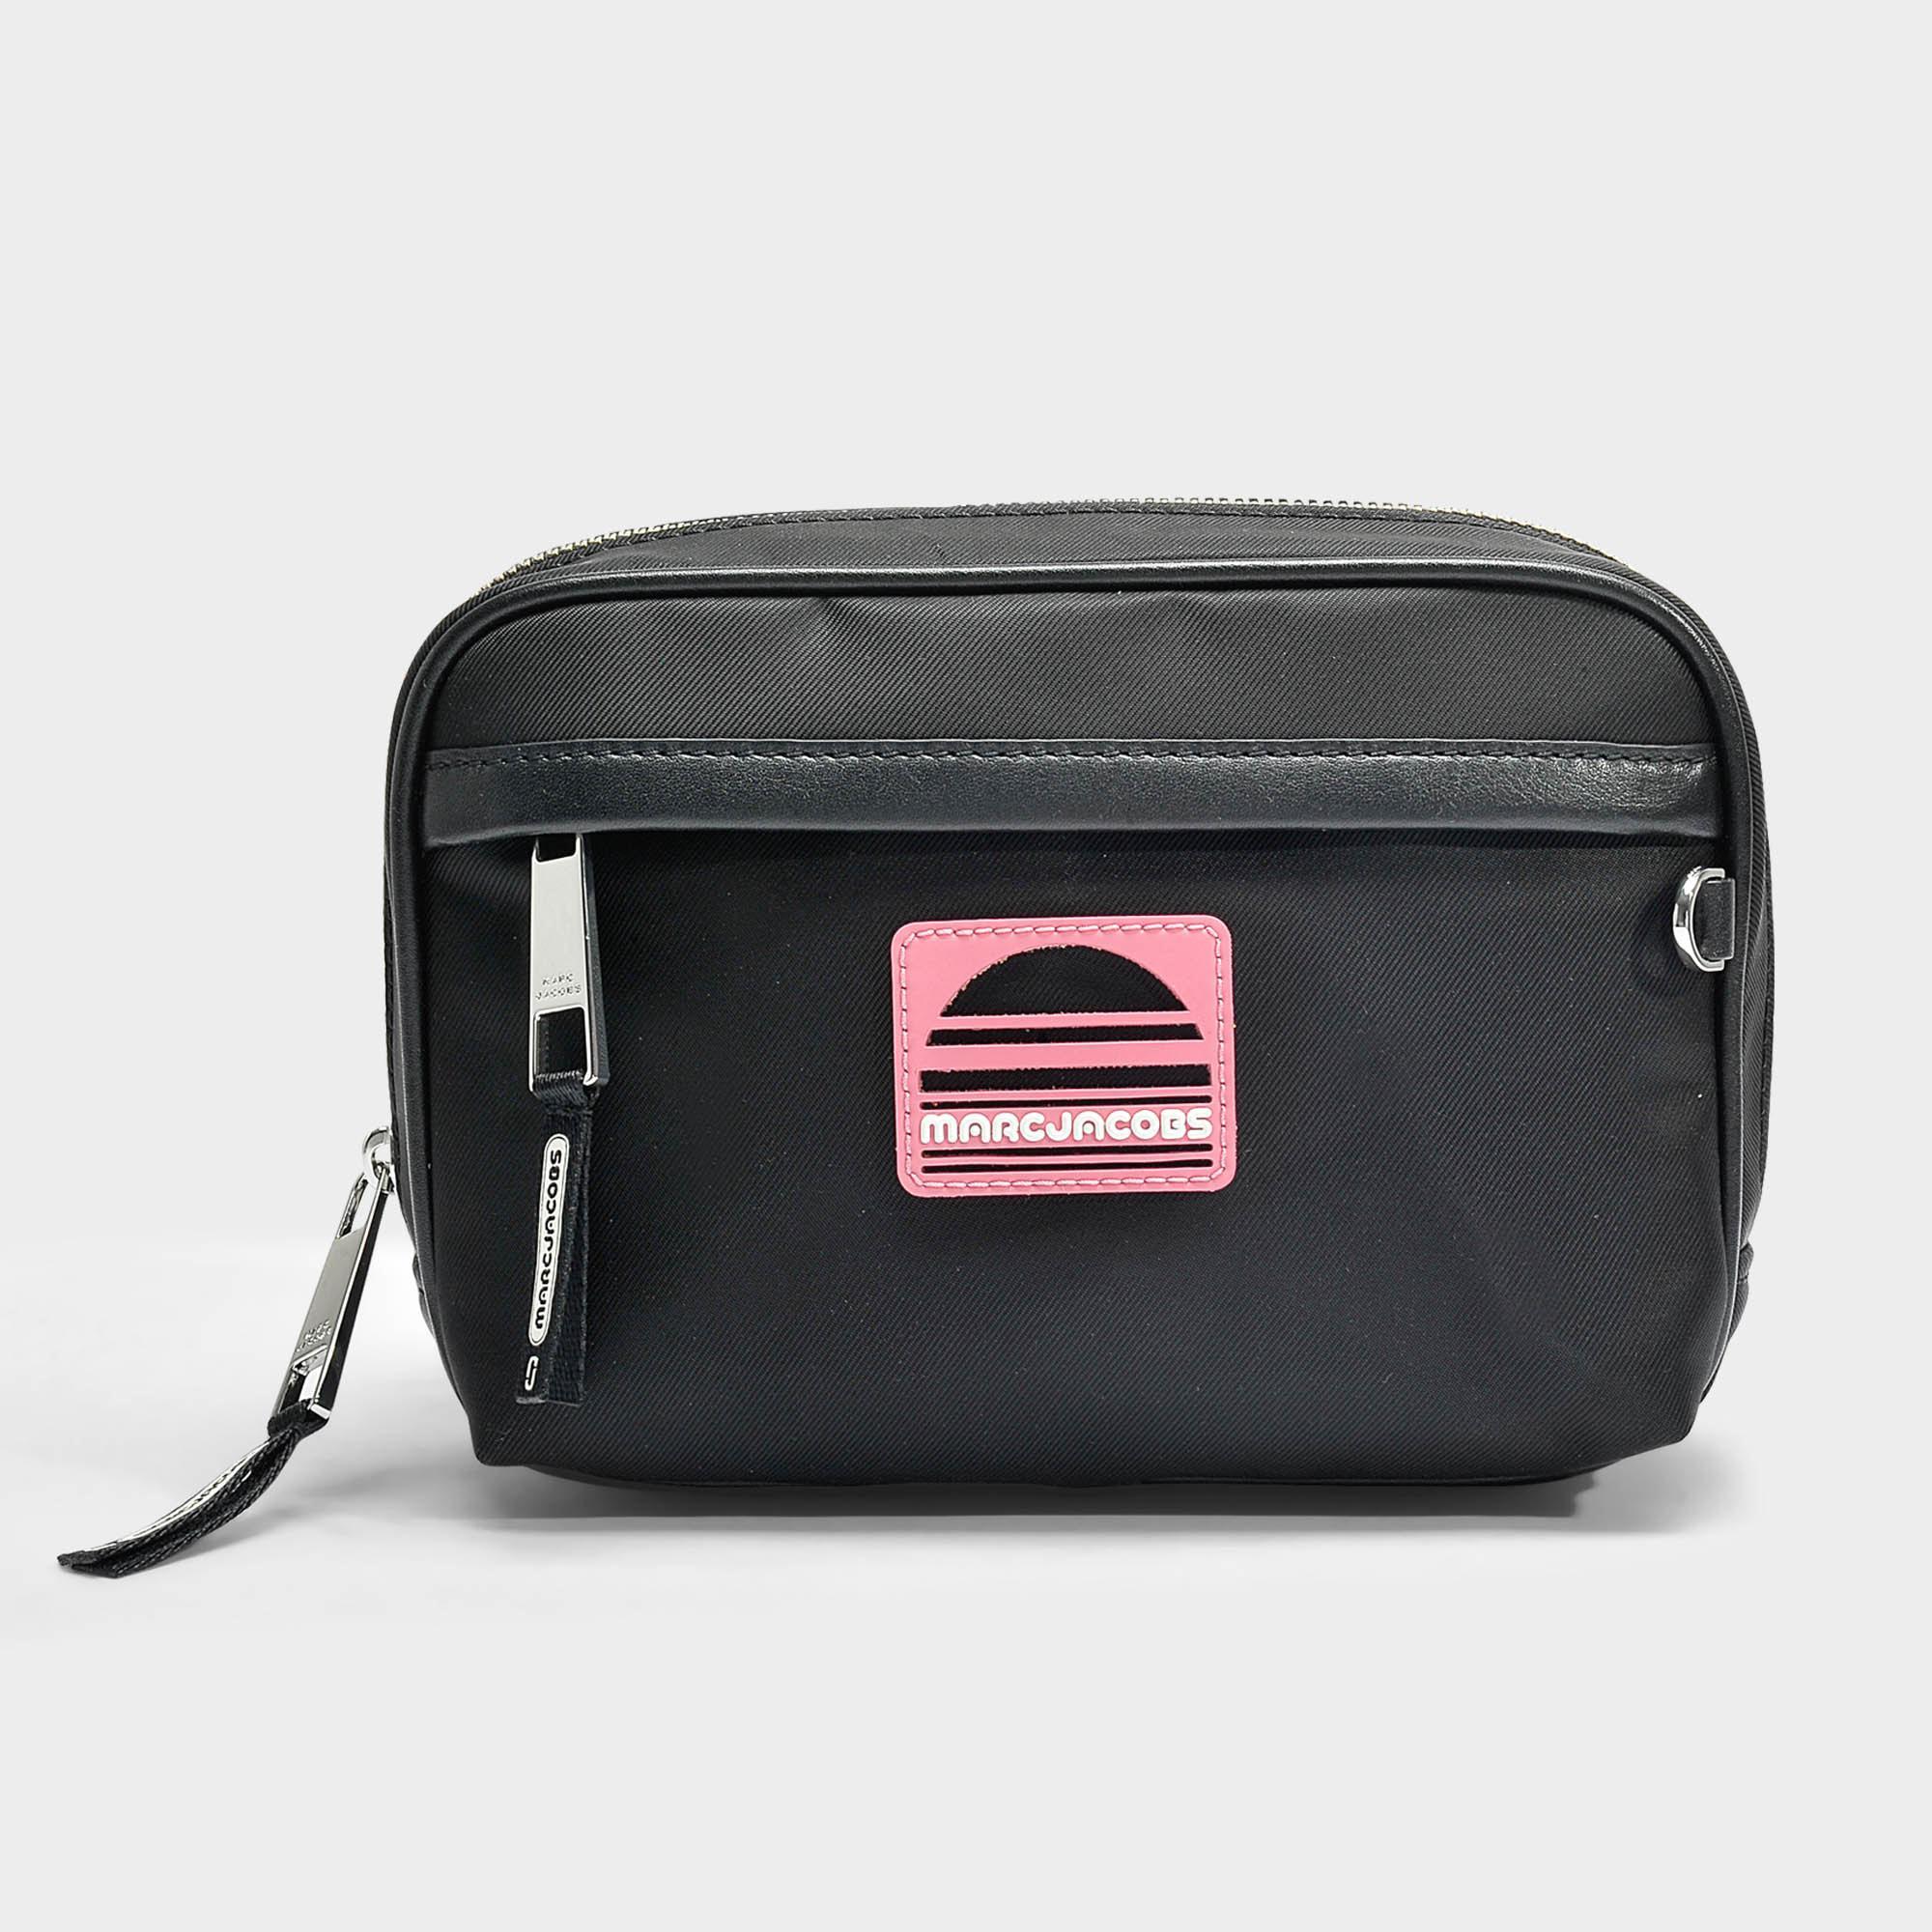 0ac63b10f7a5 Marc Jacobs Sport Belt Bag In Black Polyester in Black - Lyst